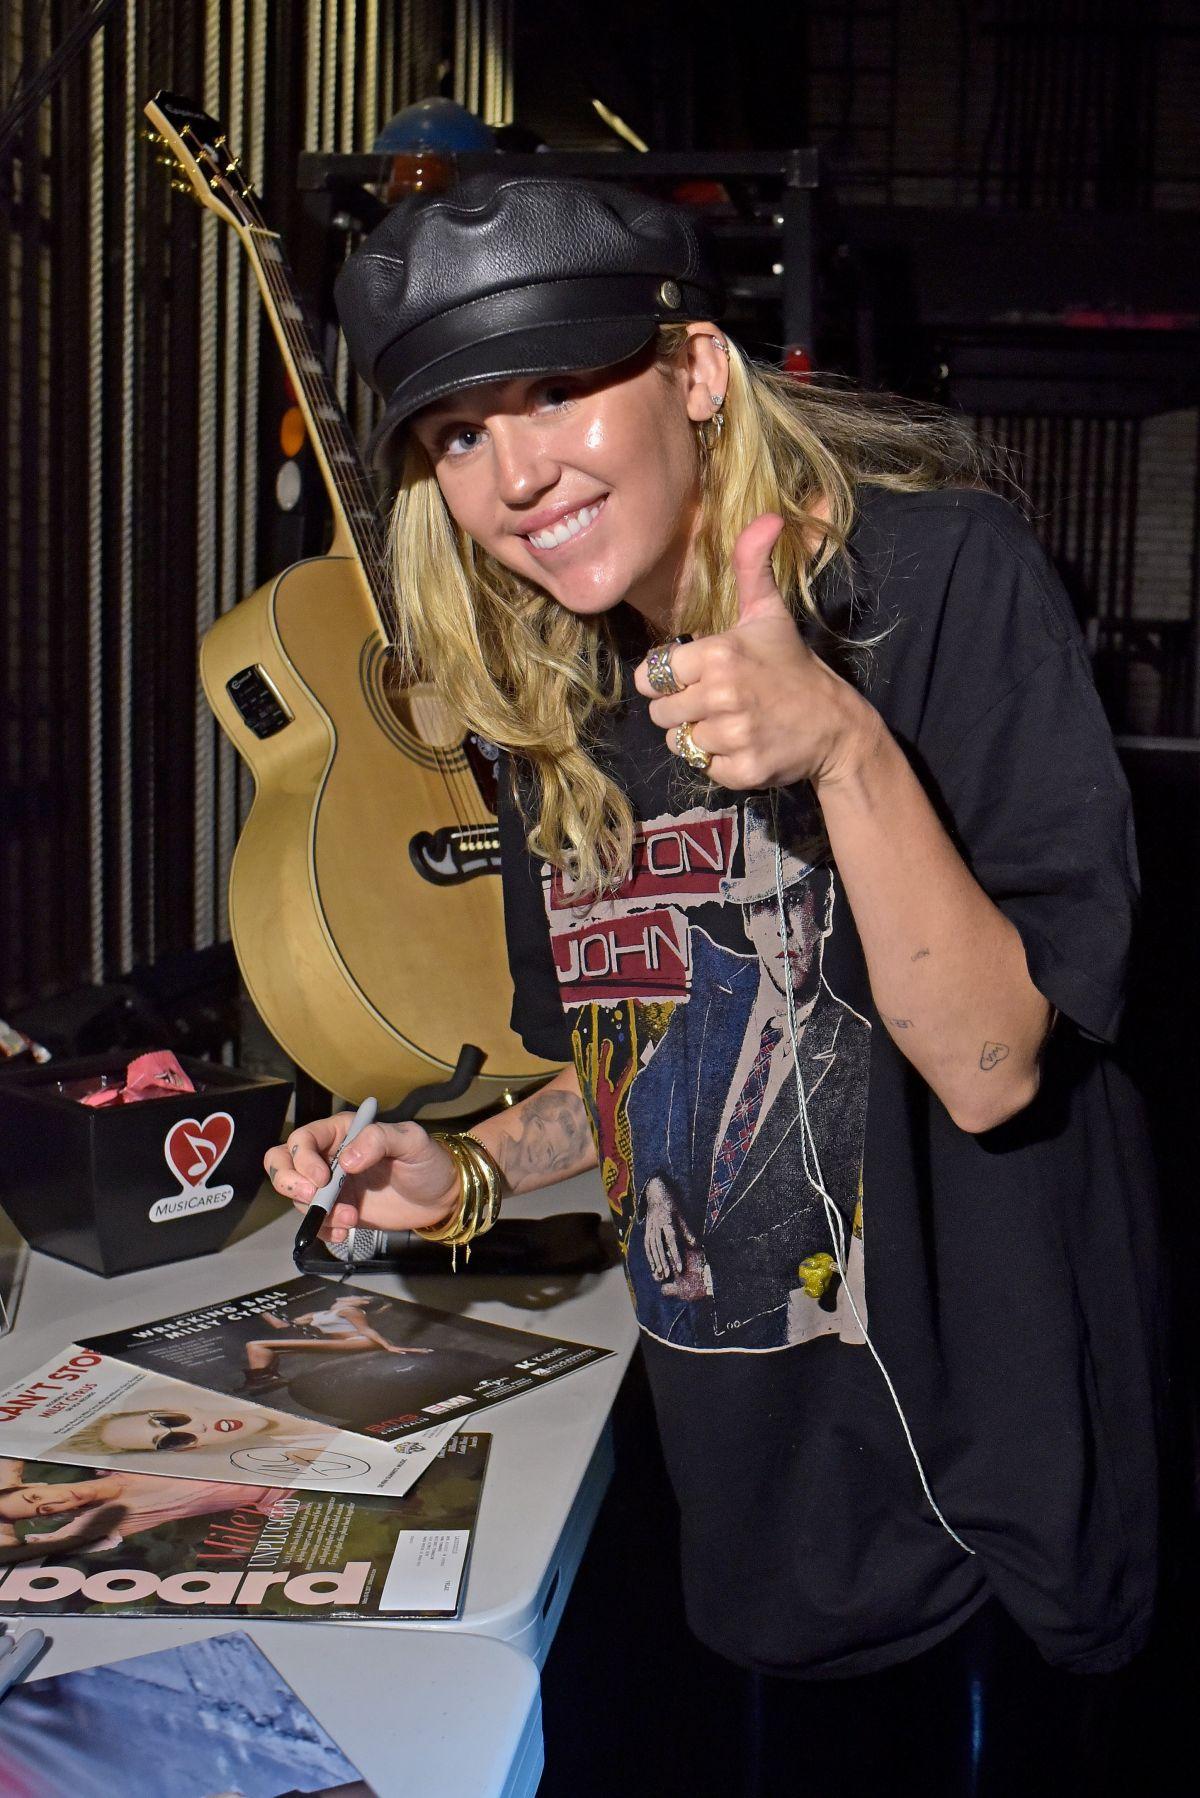 Miley cyrus upskirt 2018